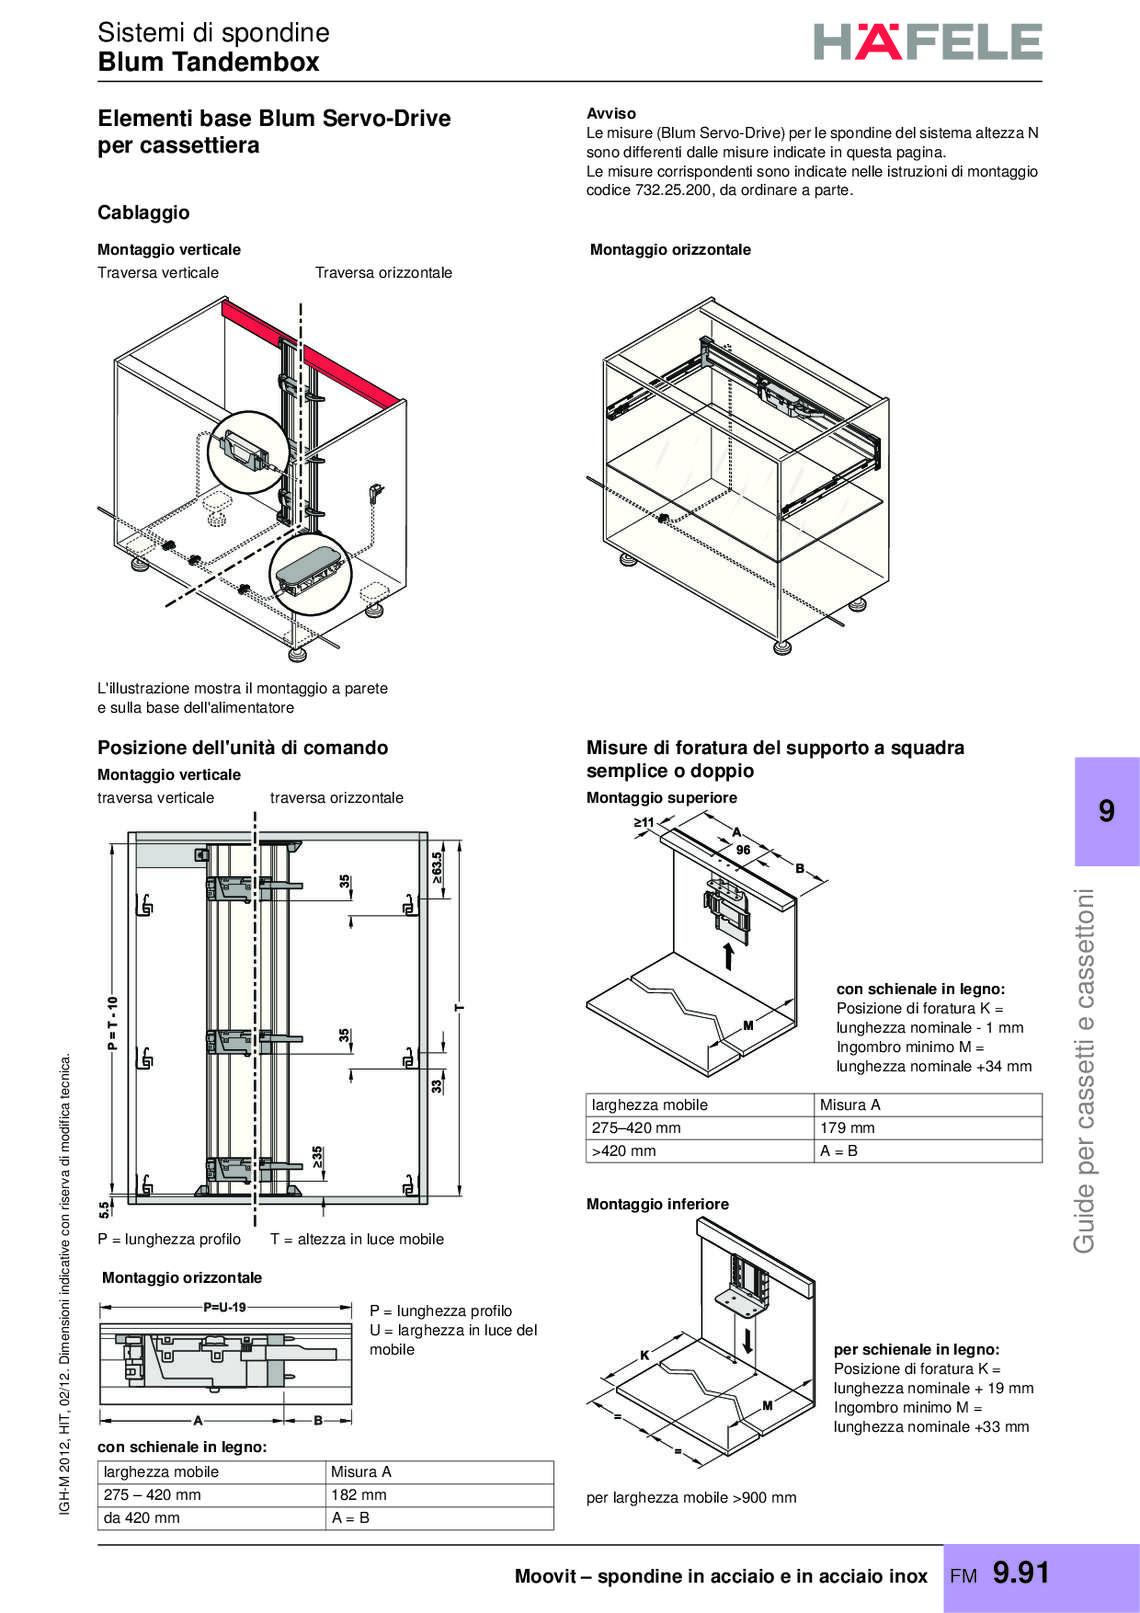 hafele-spondine-e-guide-per-mobili_40_114.jpg